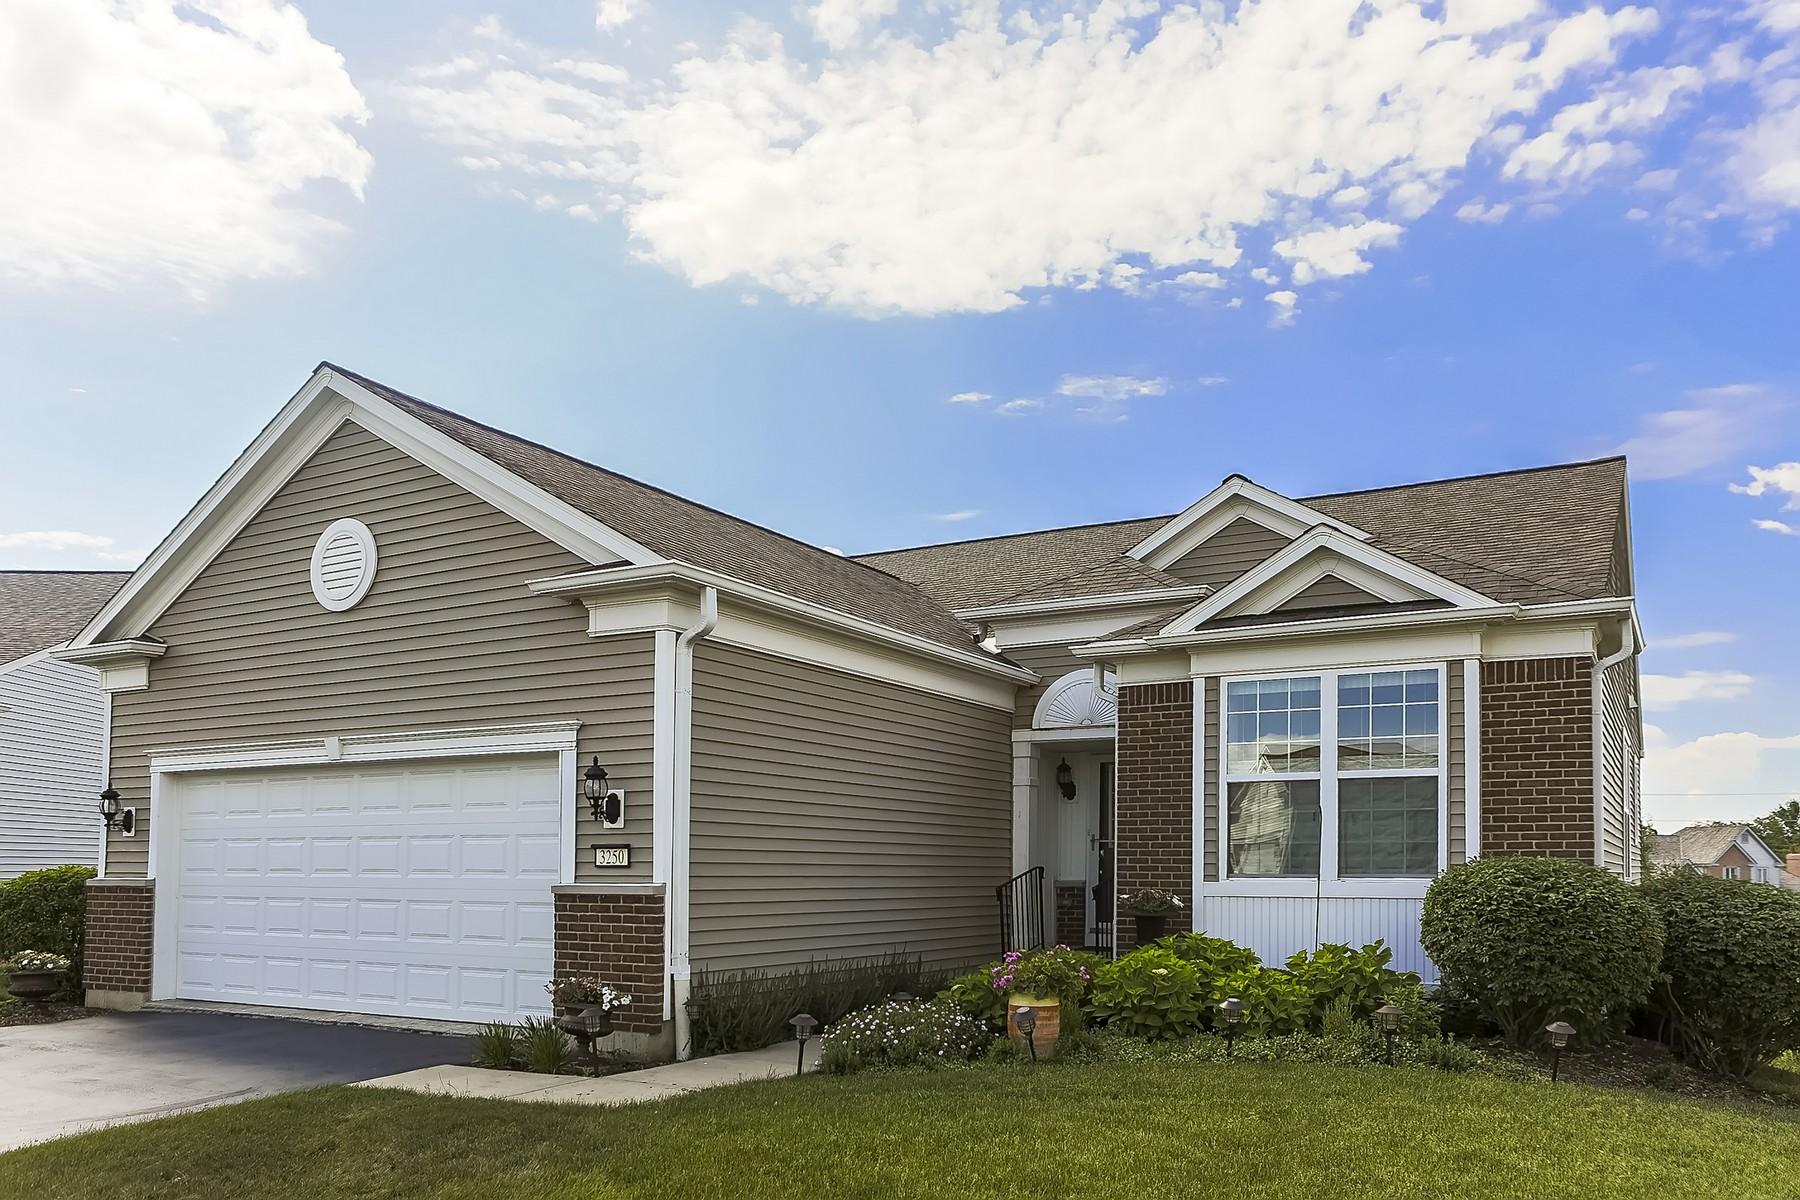 Casa Unifamiliar por un Venta en Smart And Sophisticated Style 3250 Rockwell Circle Mundelein, Illinois, 60060 Estados Unidos